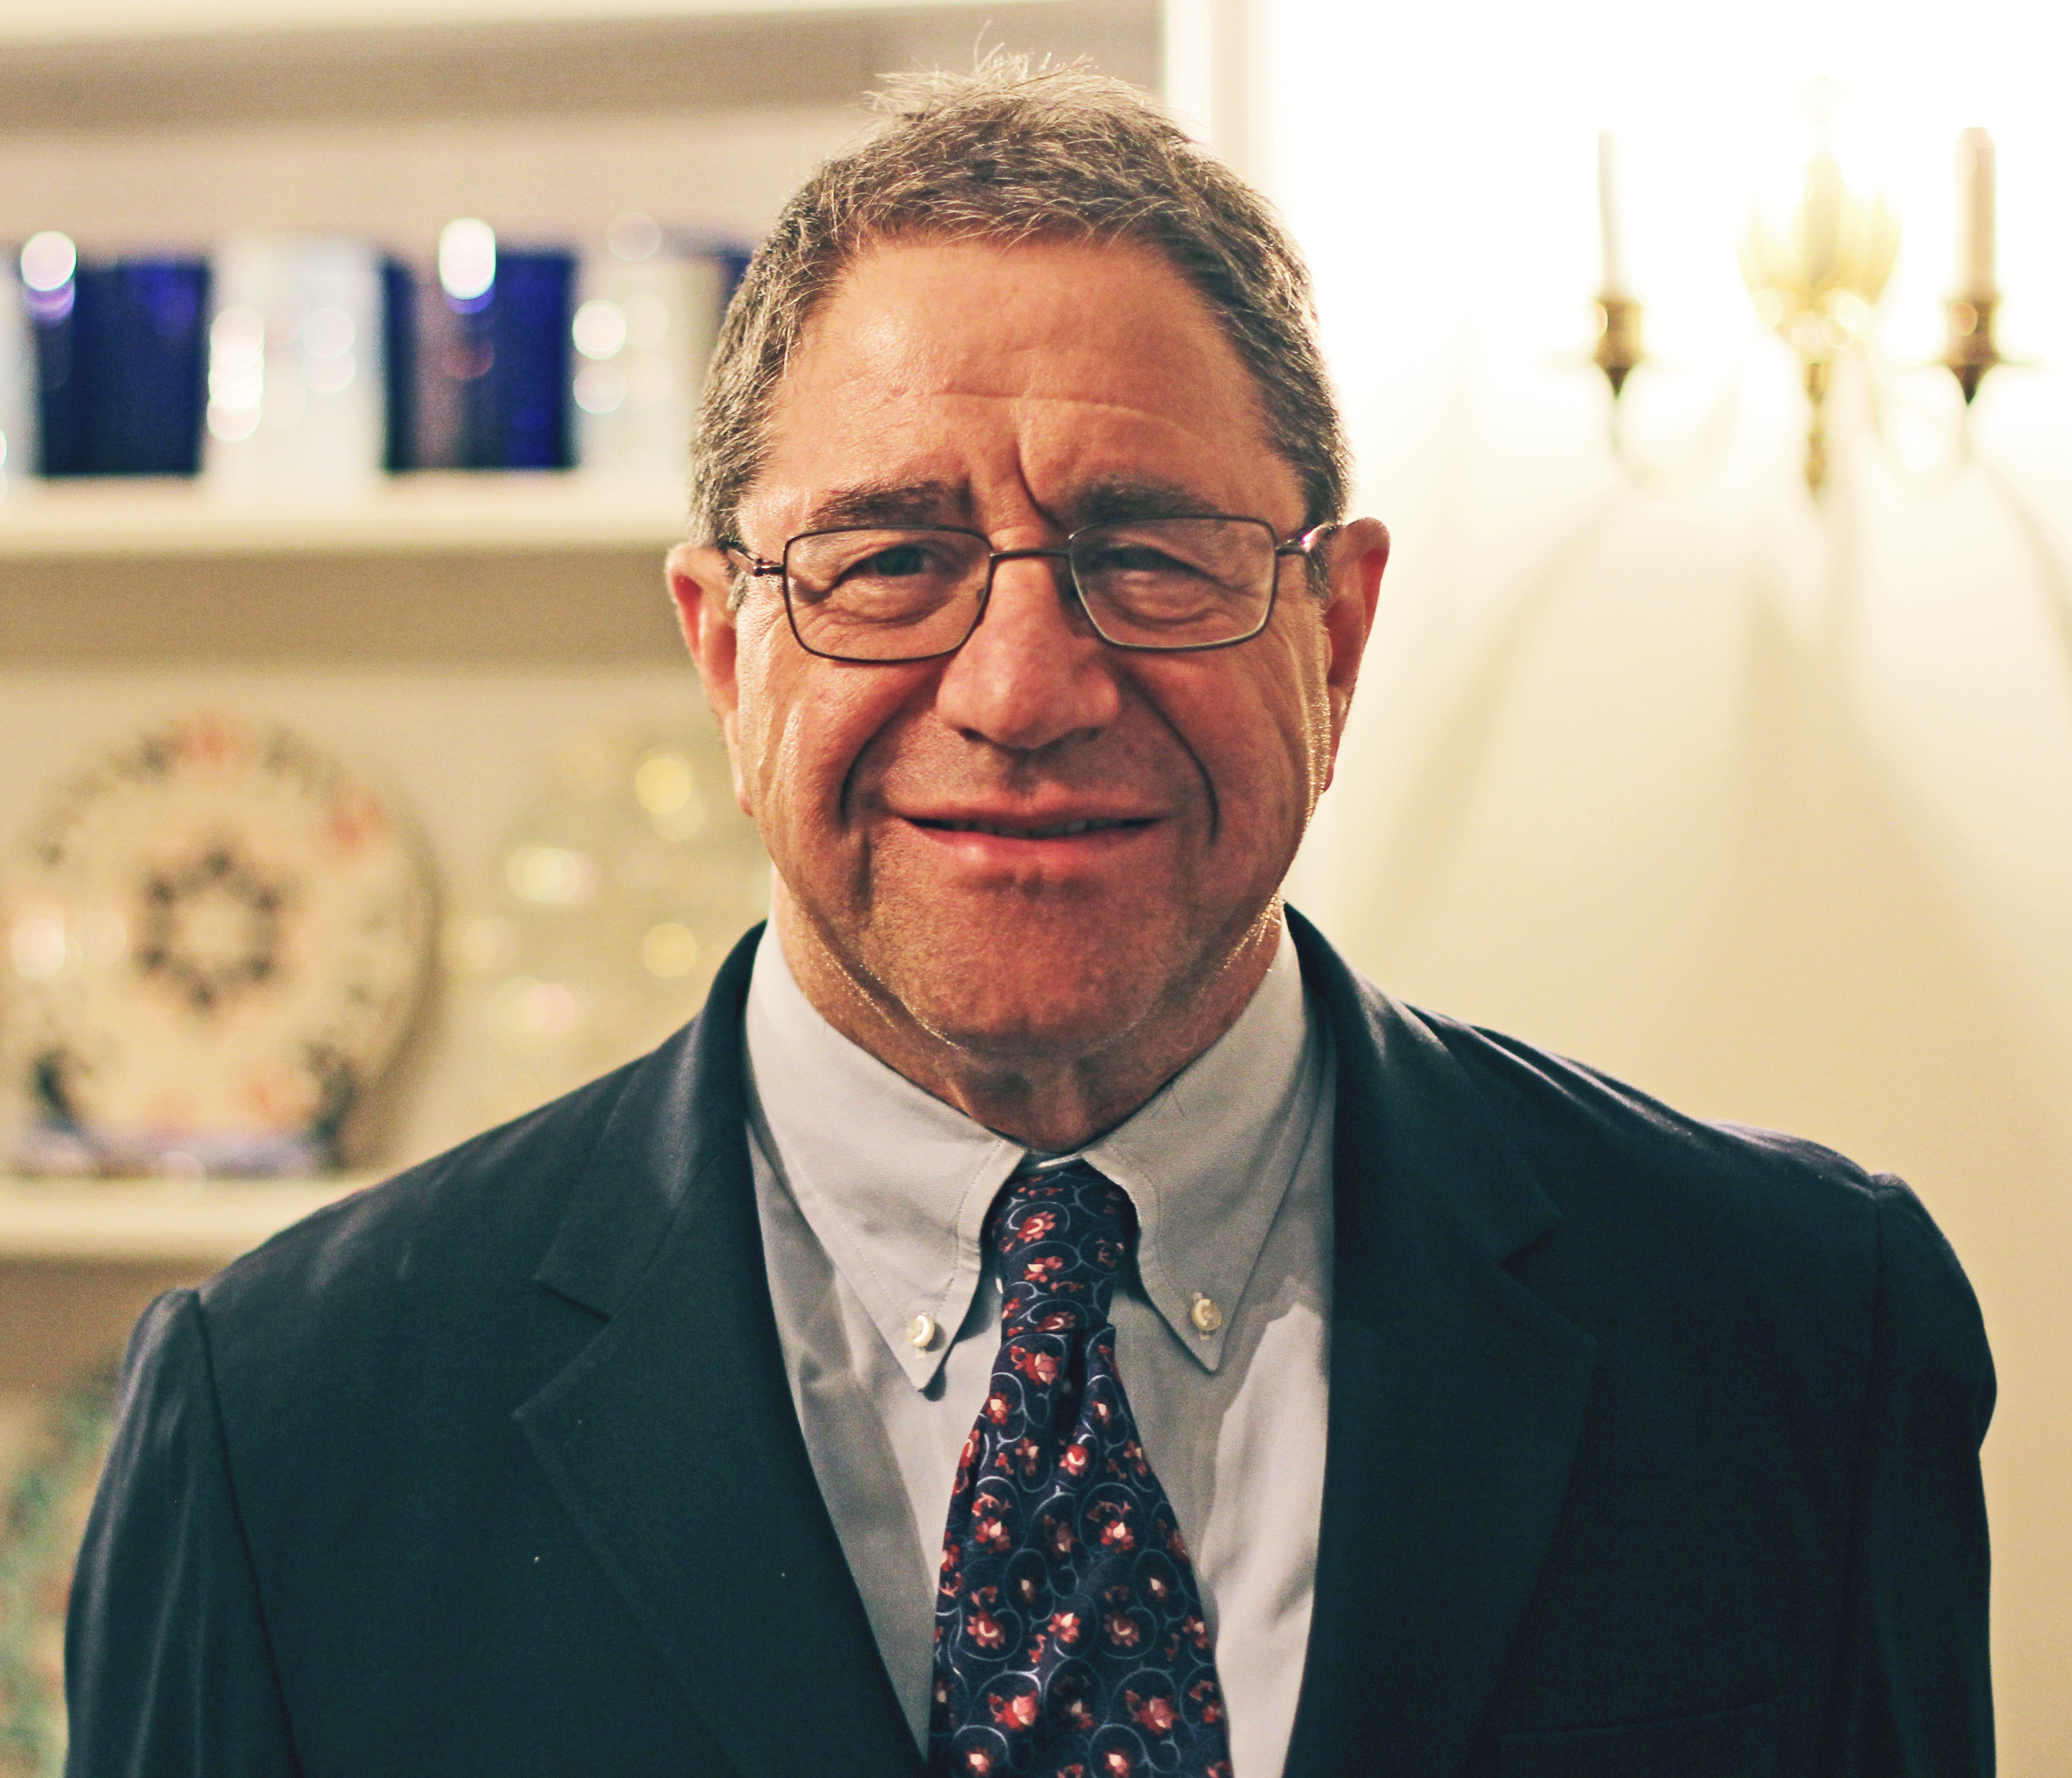 Photograph of David Stern.